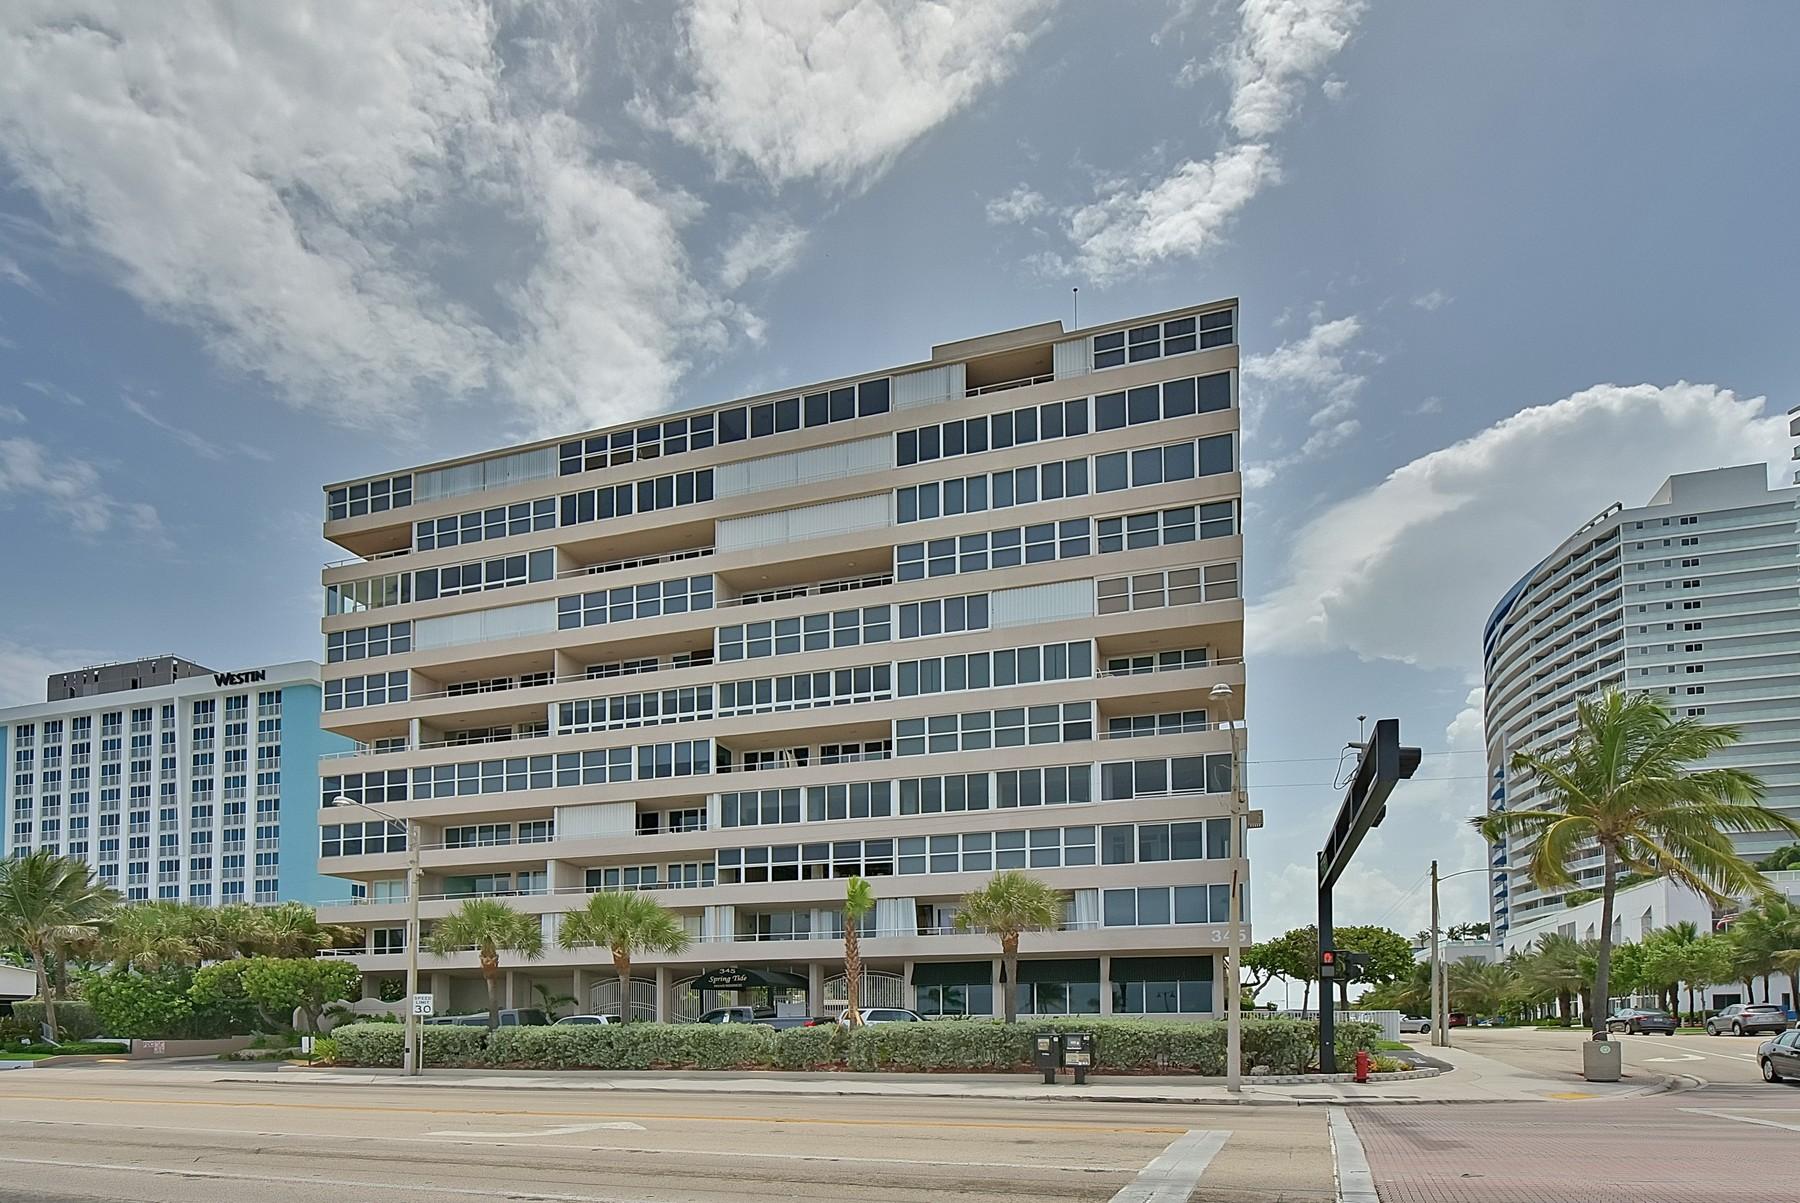 Condominium for Sale at Spring Tide 345 N. Ft. Lauderdale Beach Blvd. #503 Fort Lauderdale, Florida 33304 United States